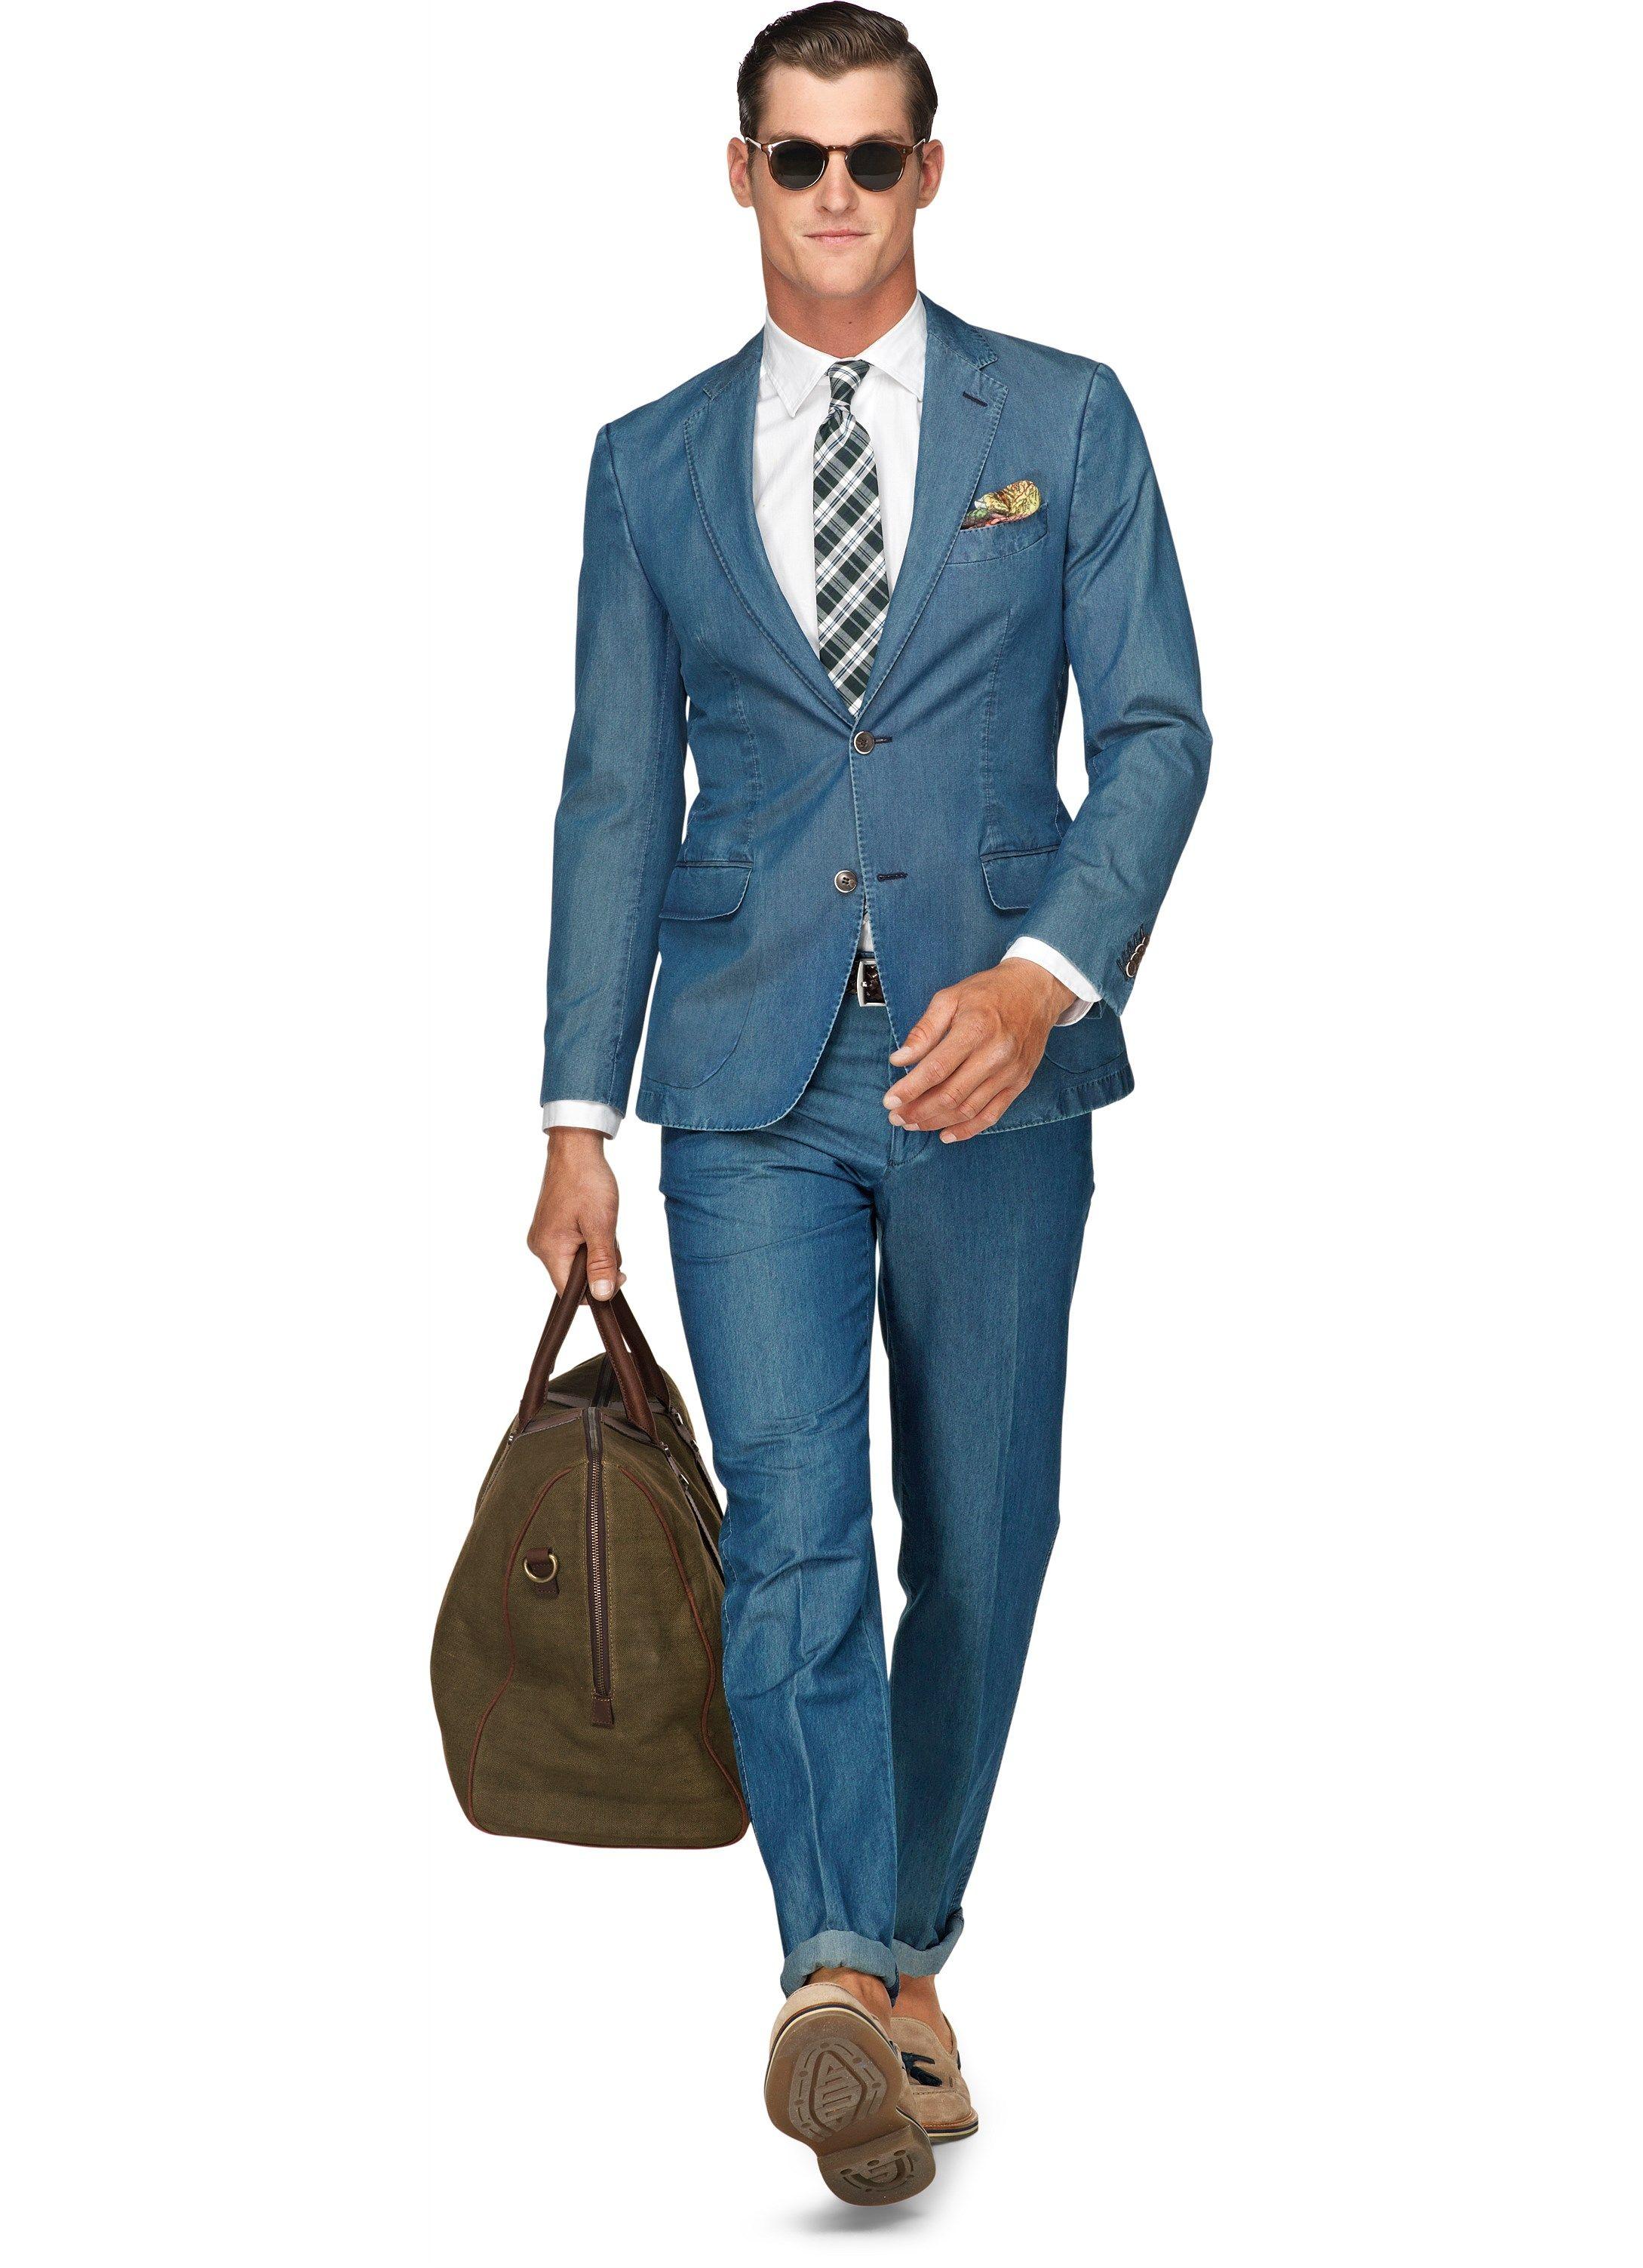 Suitsupply Suit Blue Plain Copenhagen   Dapper Gentleman   Pinterest ...